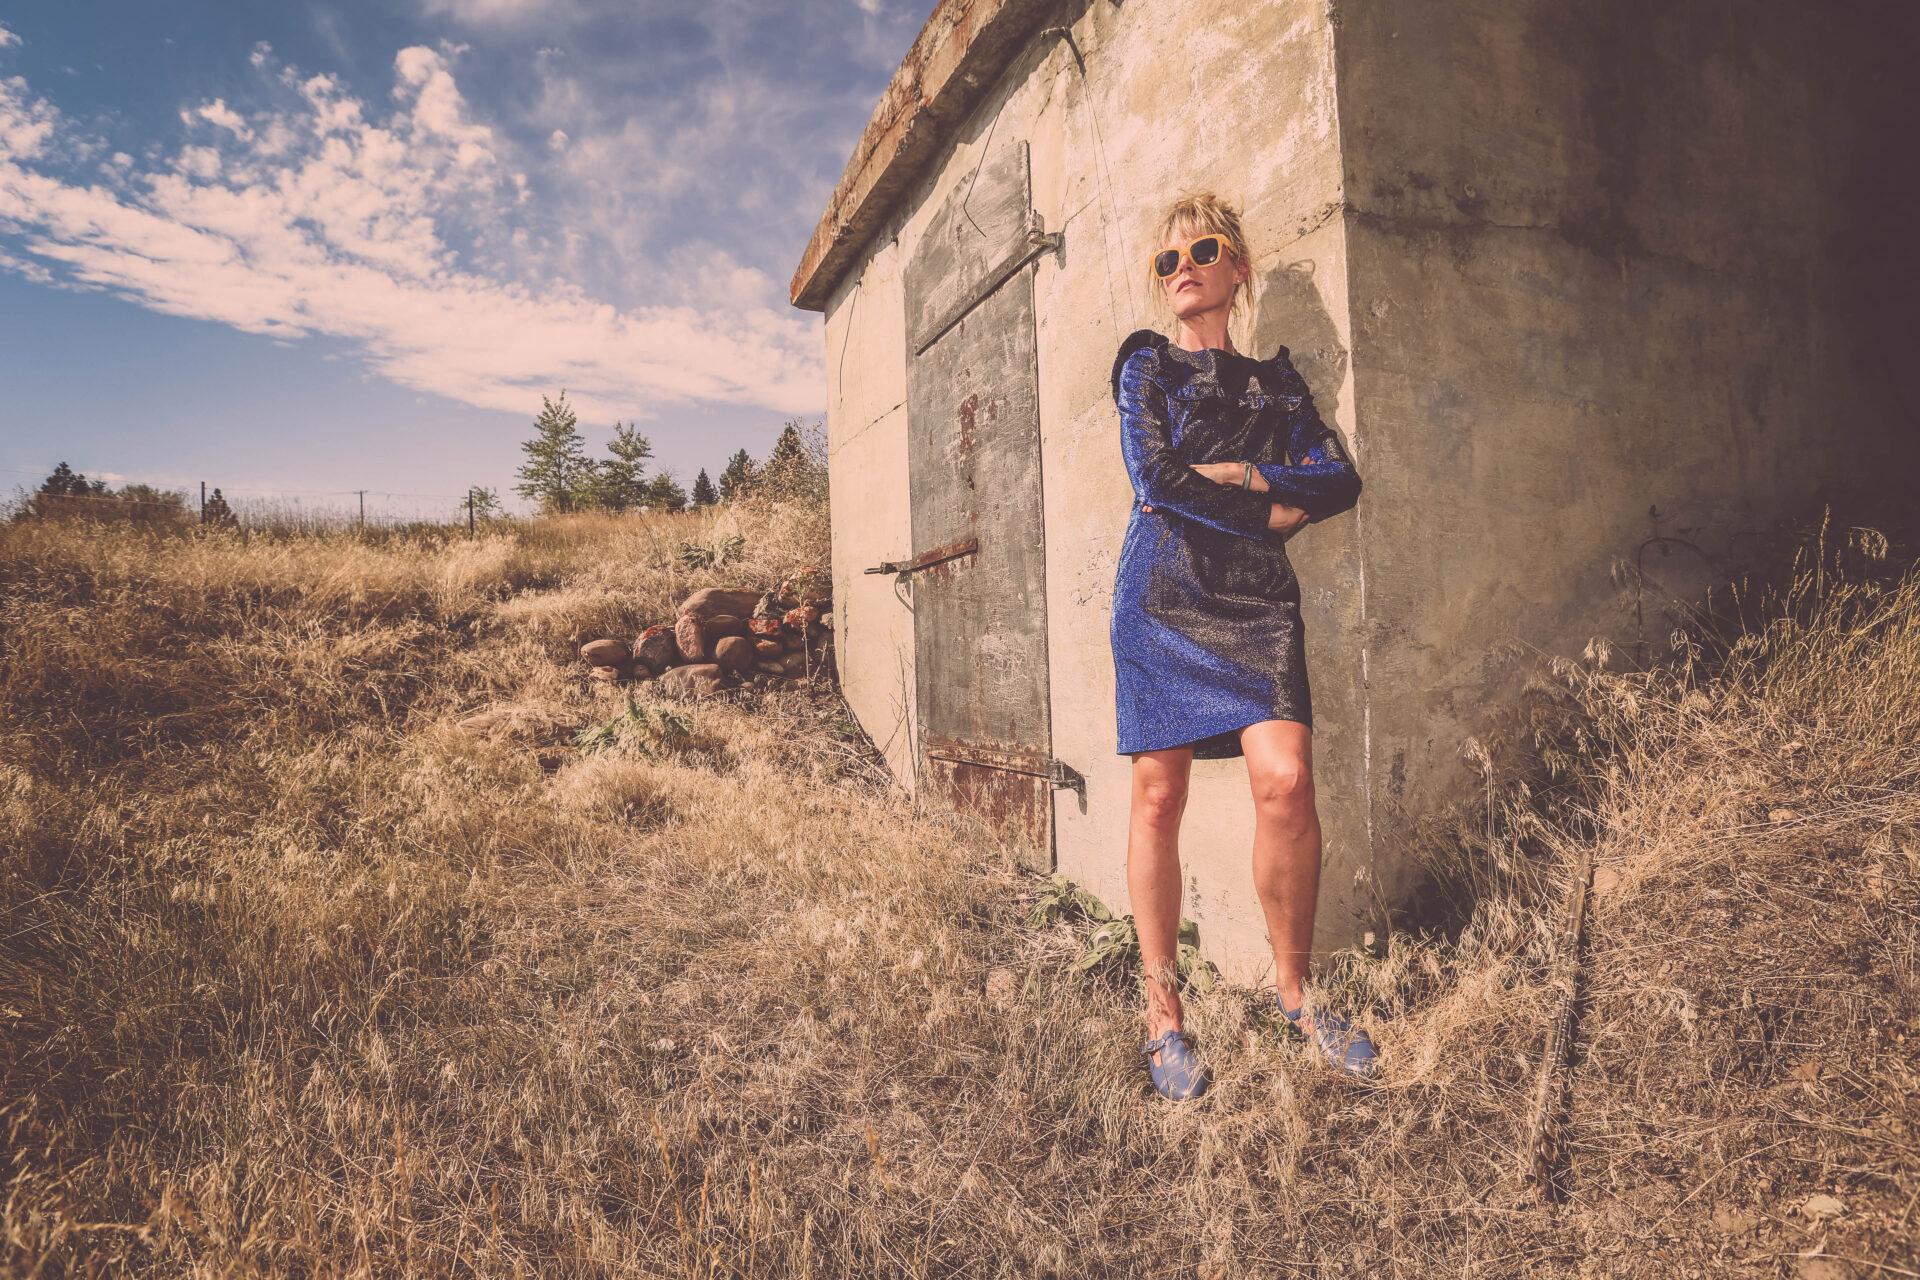 EXCLUSIVE: Sasha Bell (Essex green / Ladybug Transistor) 'Castle Keep' Video Premiere